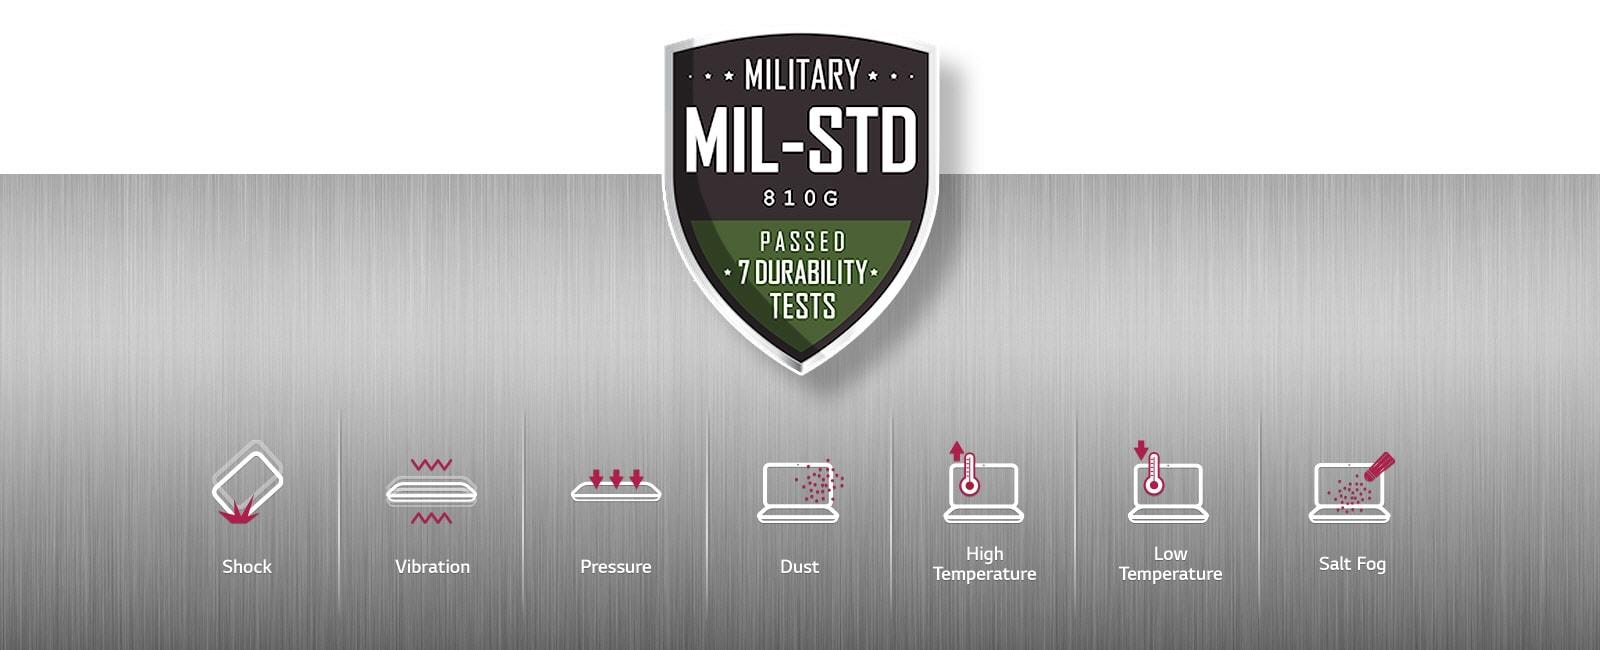 17 inch gram laptop MIL-STD-810G